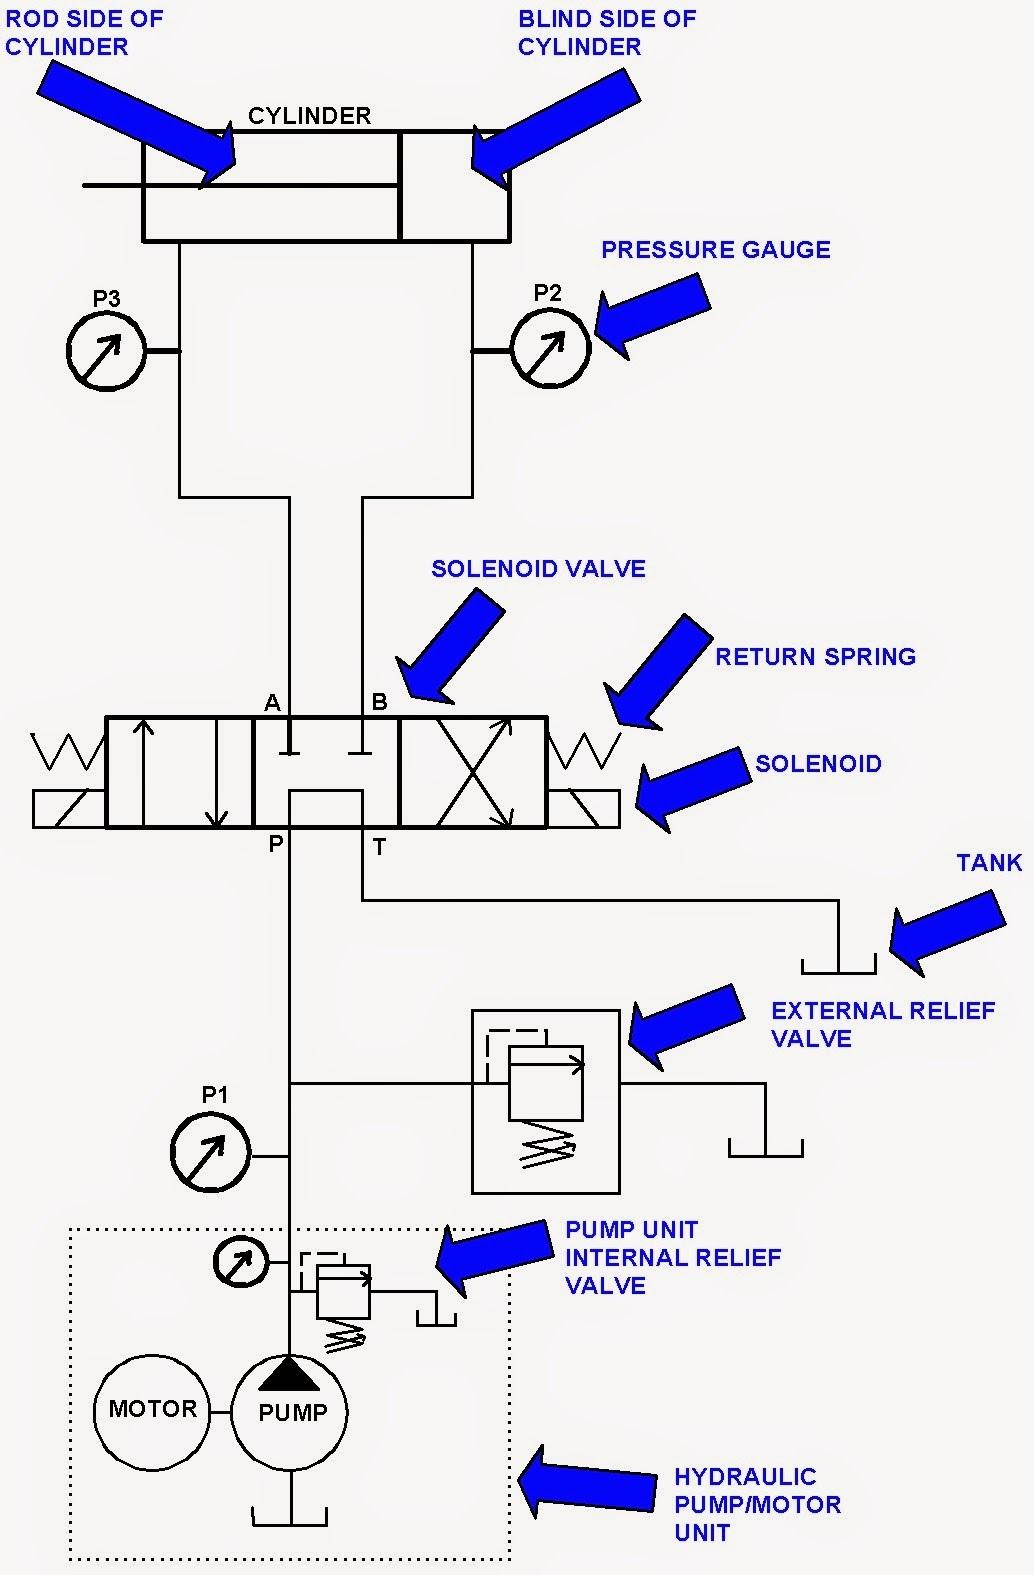 Hydraulic System For Beginners